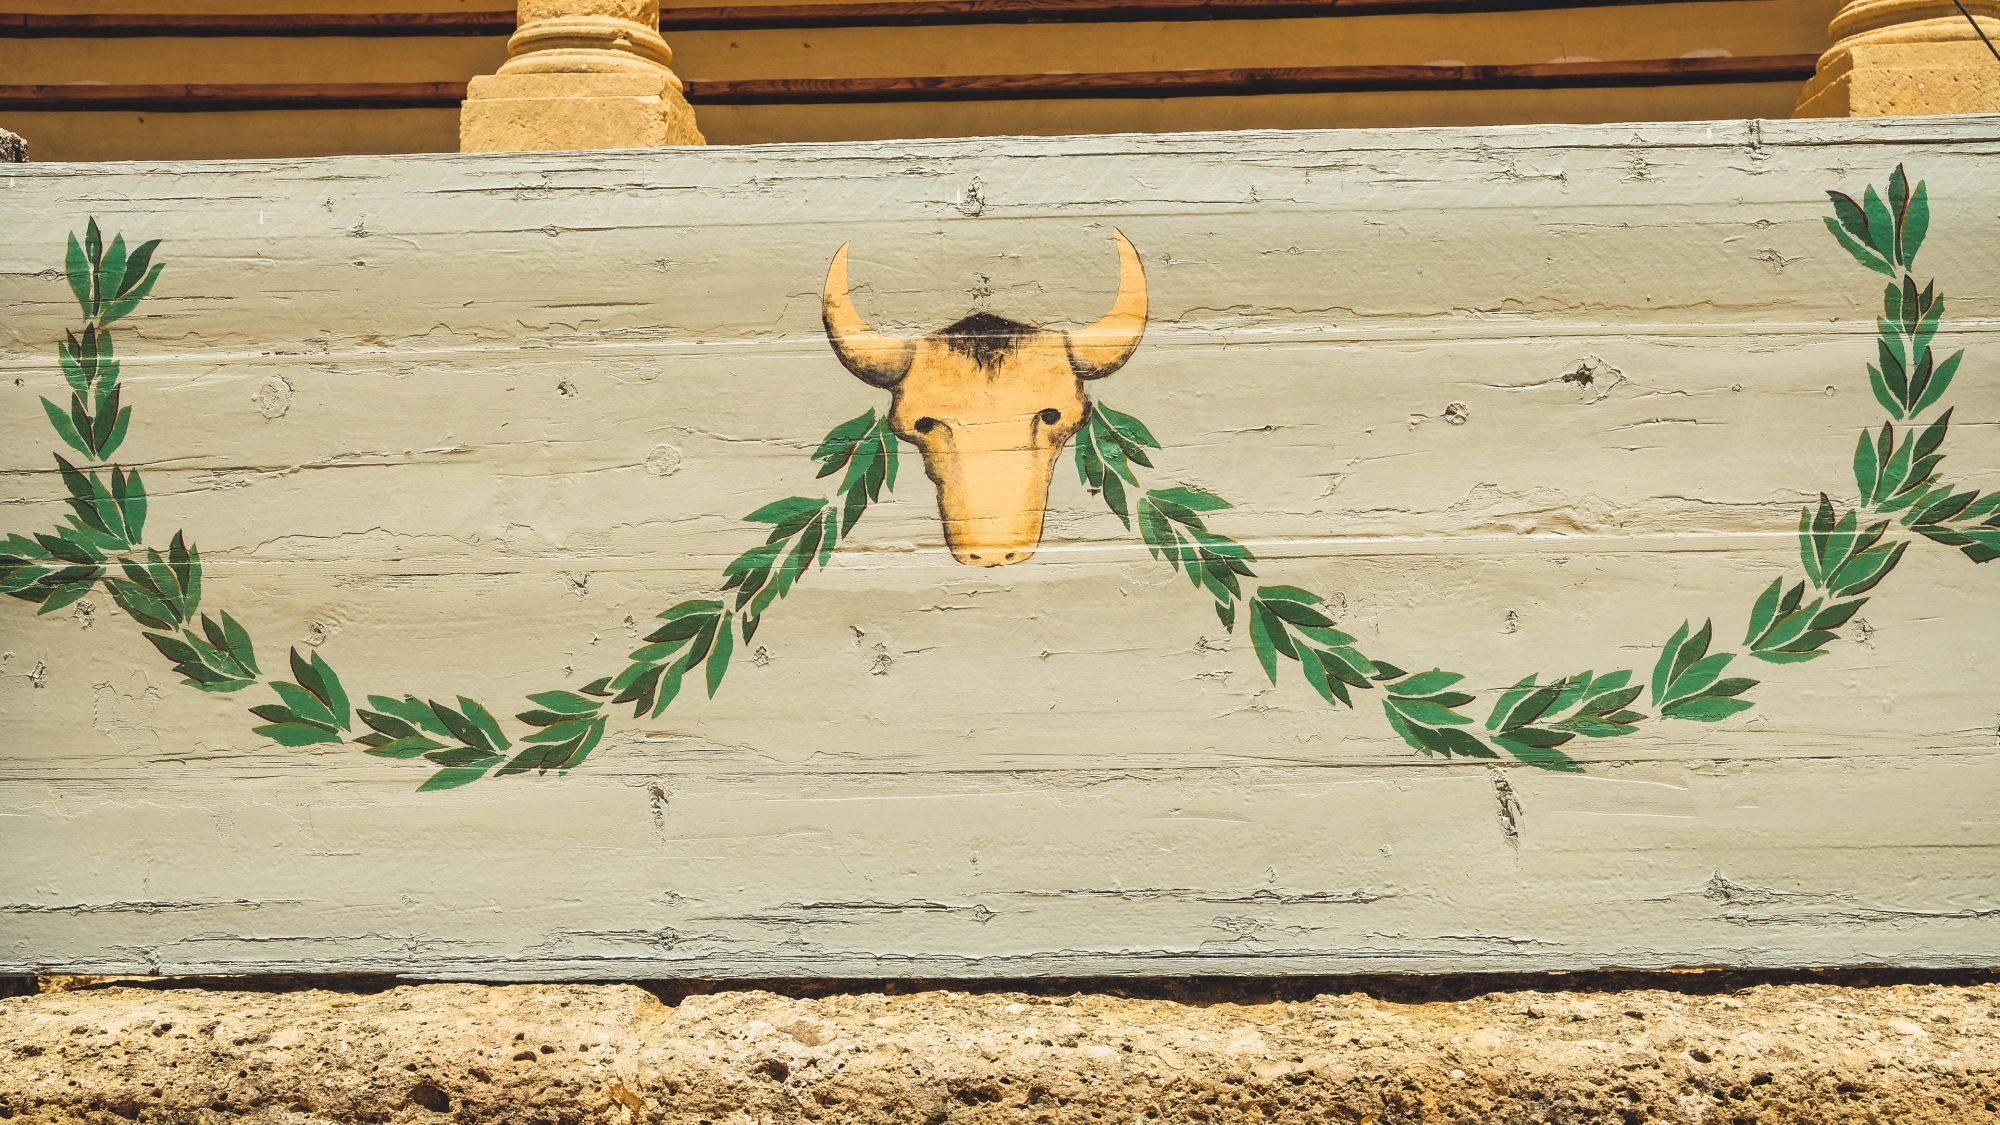 Décoration bovine - Ronda, Espagne